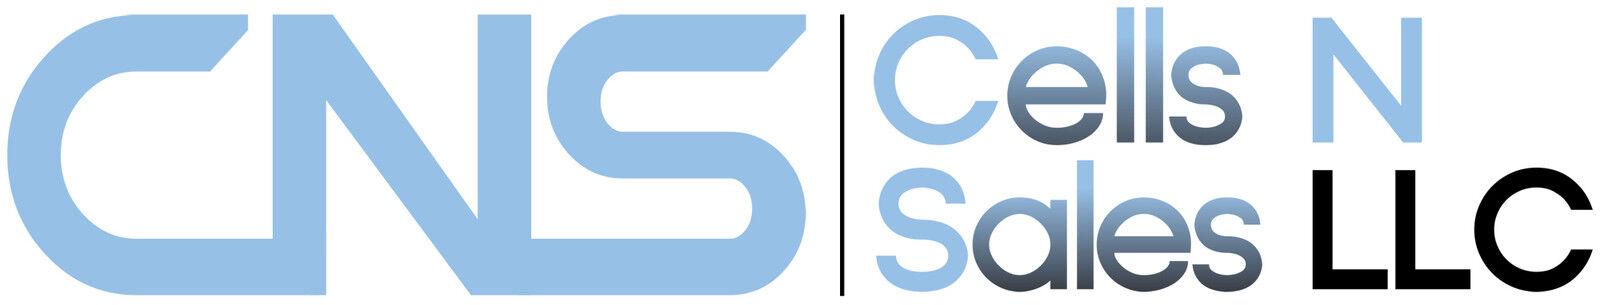 Cells N Sales LLC